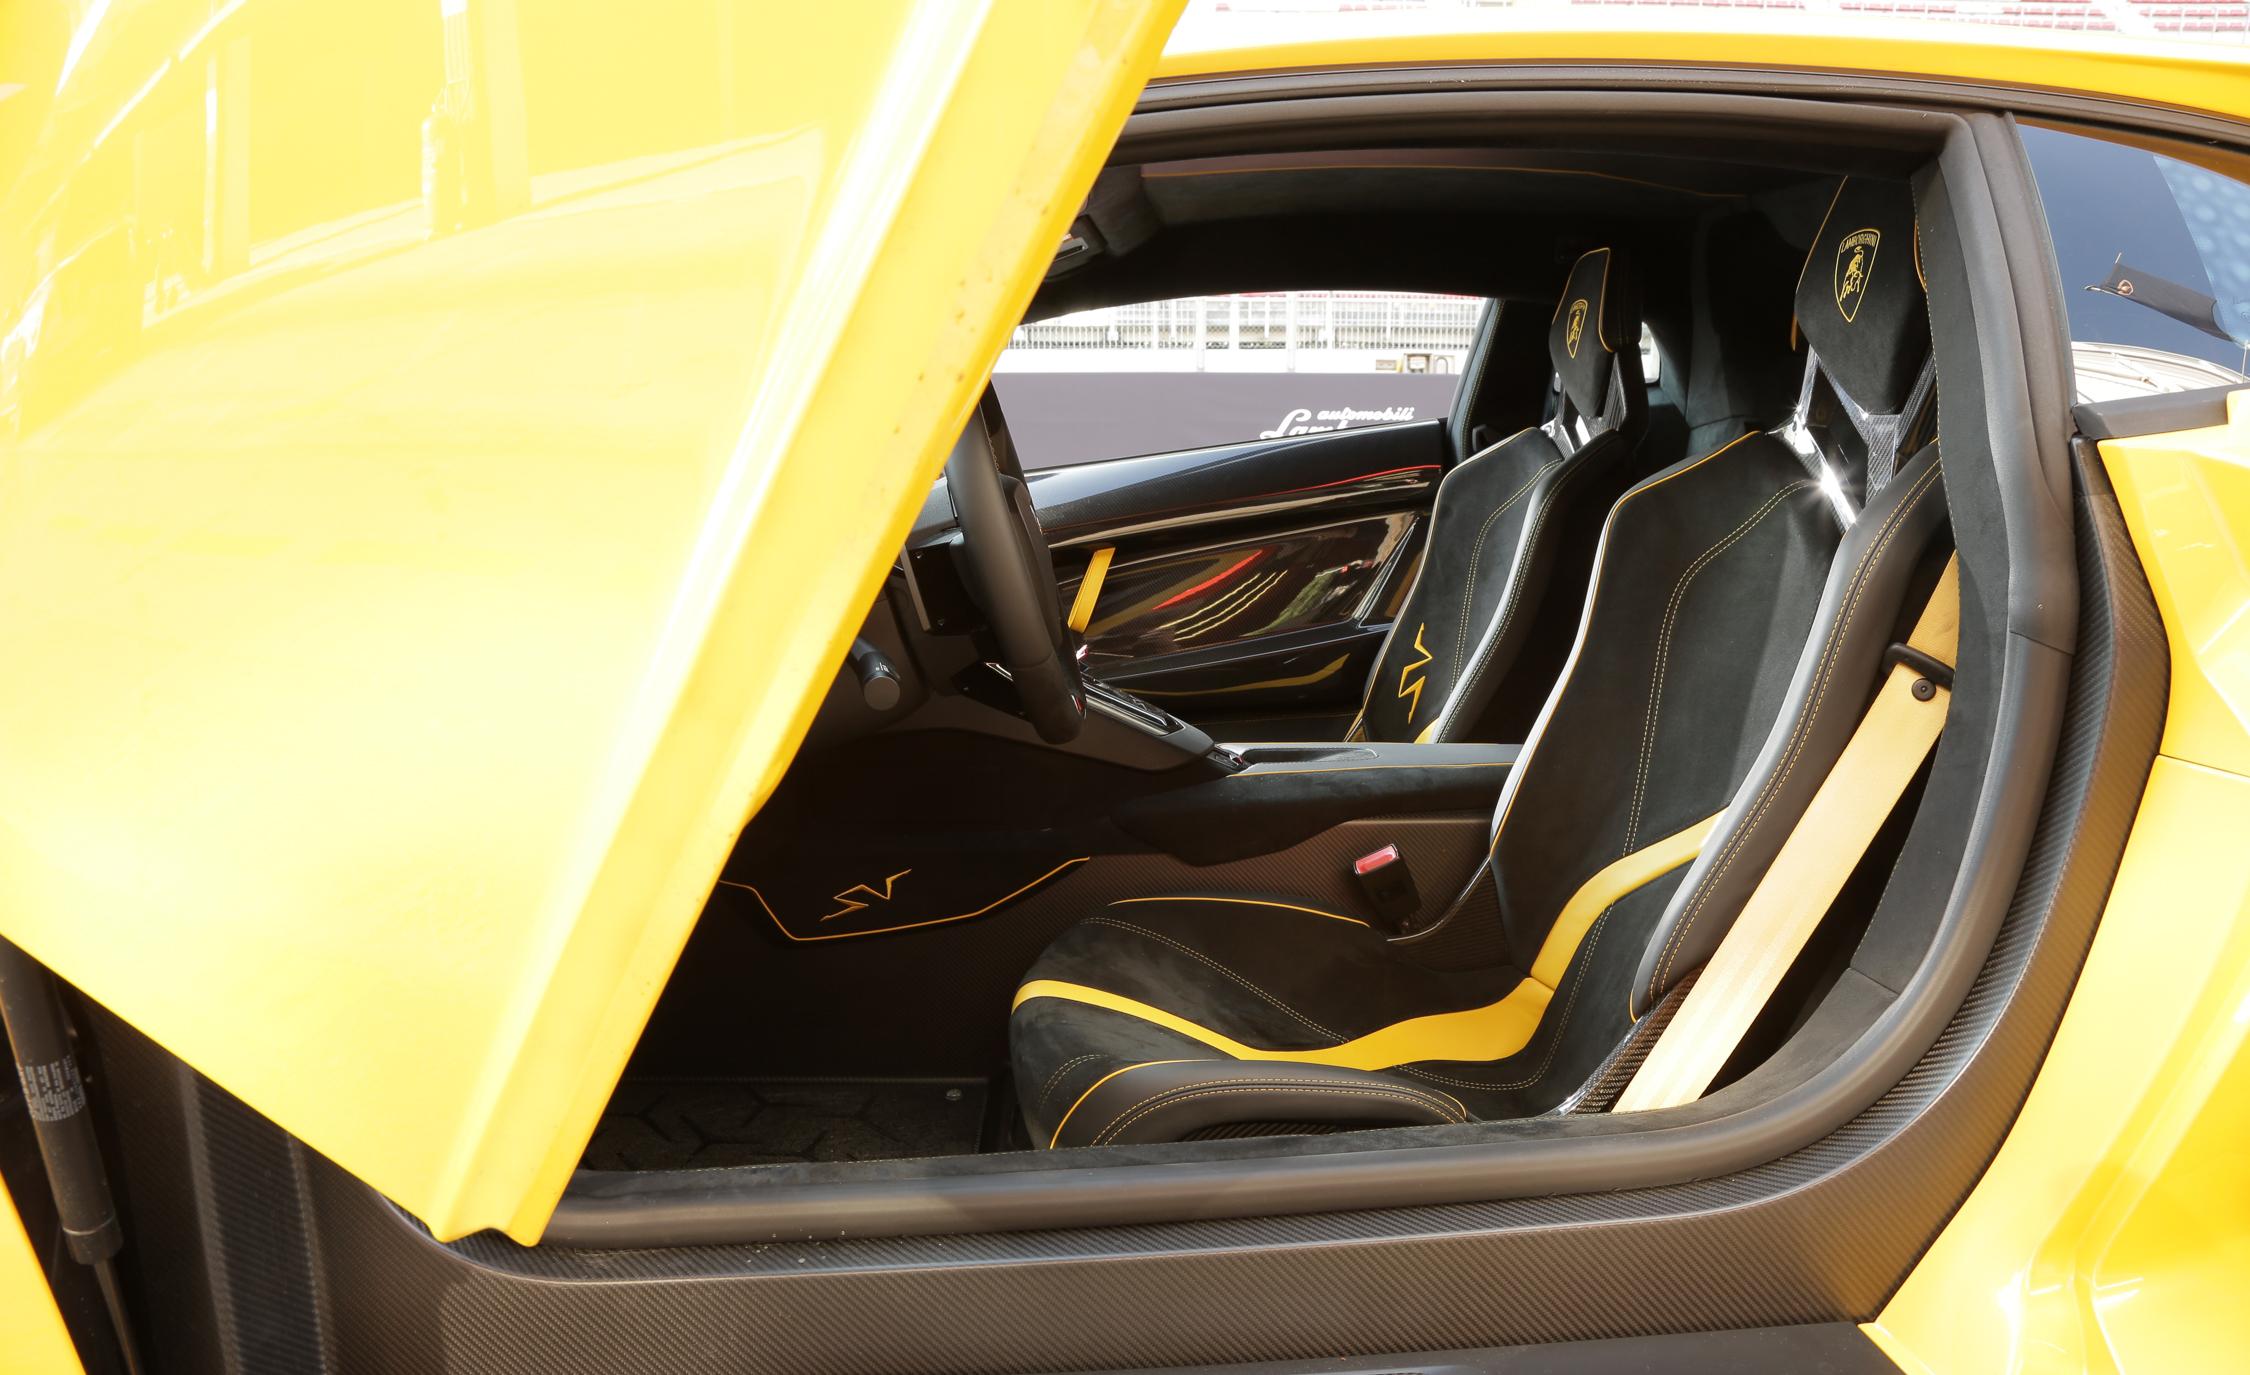 2016 Lamborghini Aventador LP750 4 SV (Photo 4 of 48)